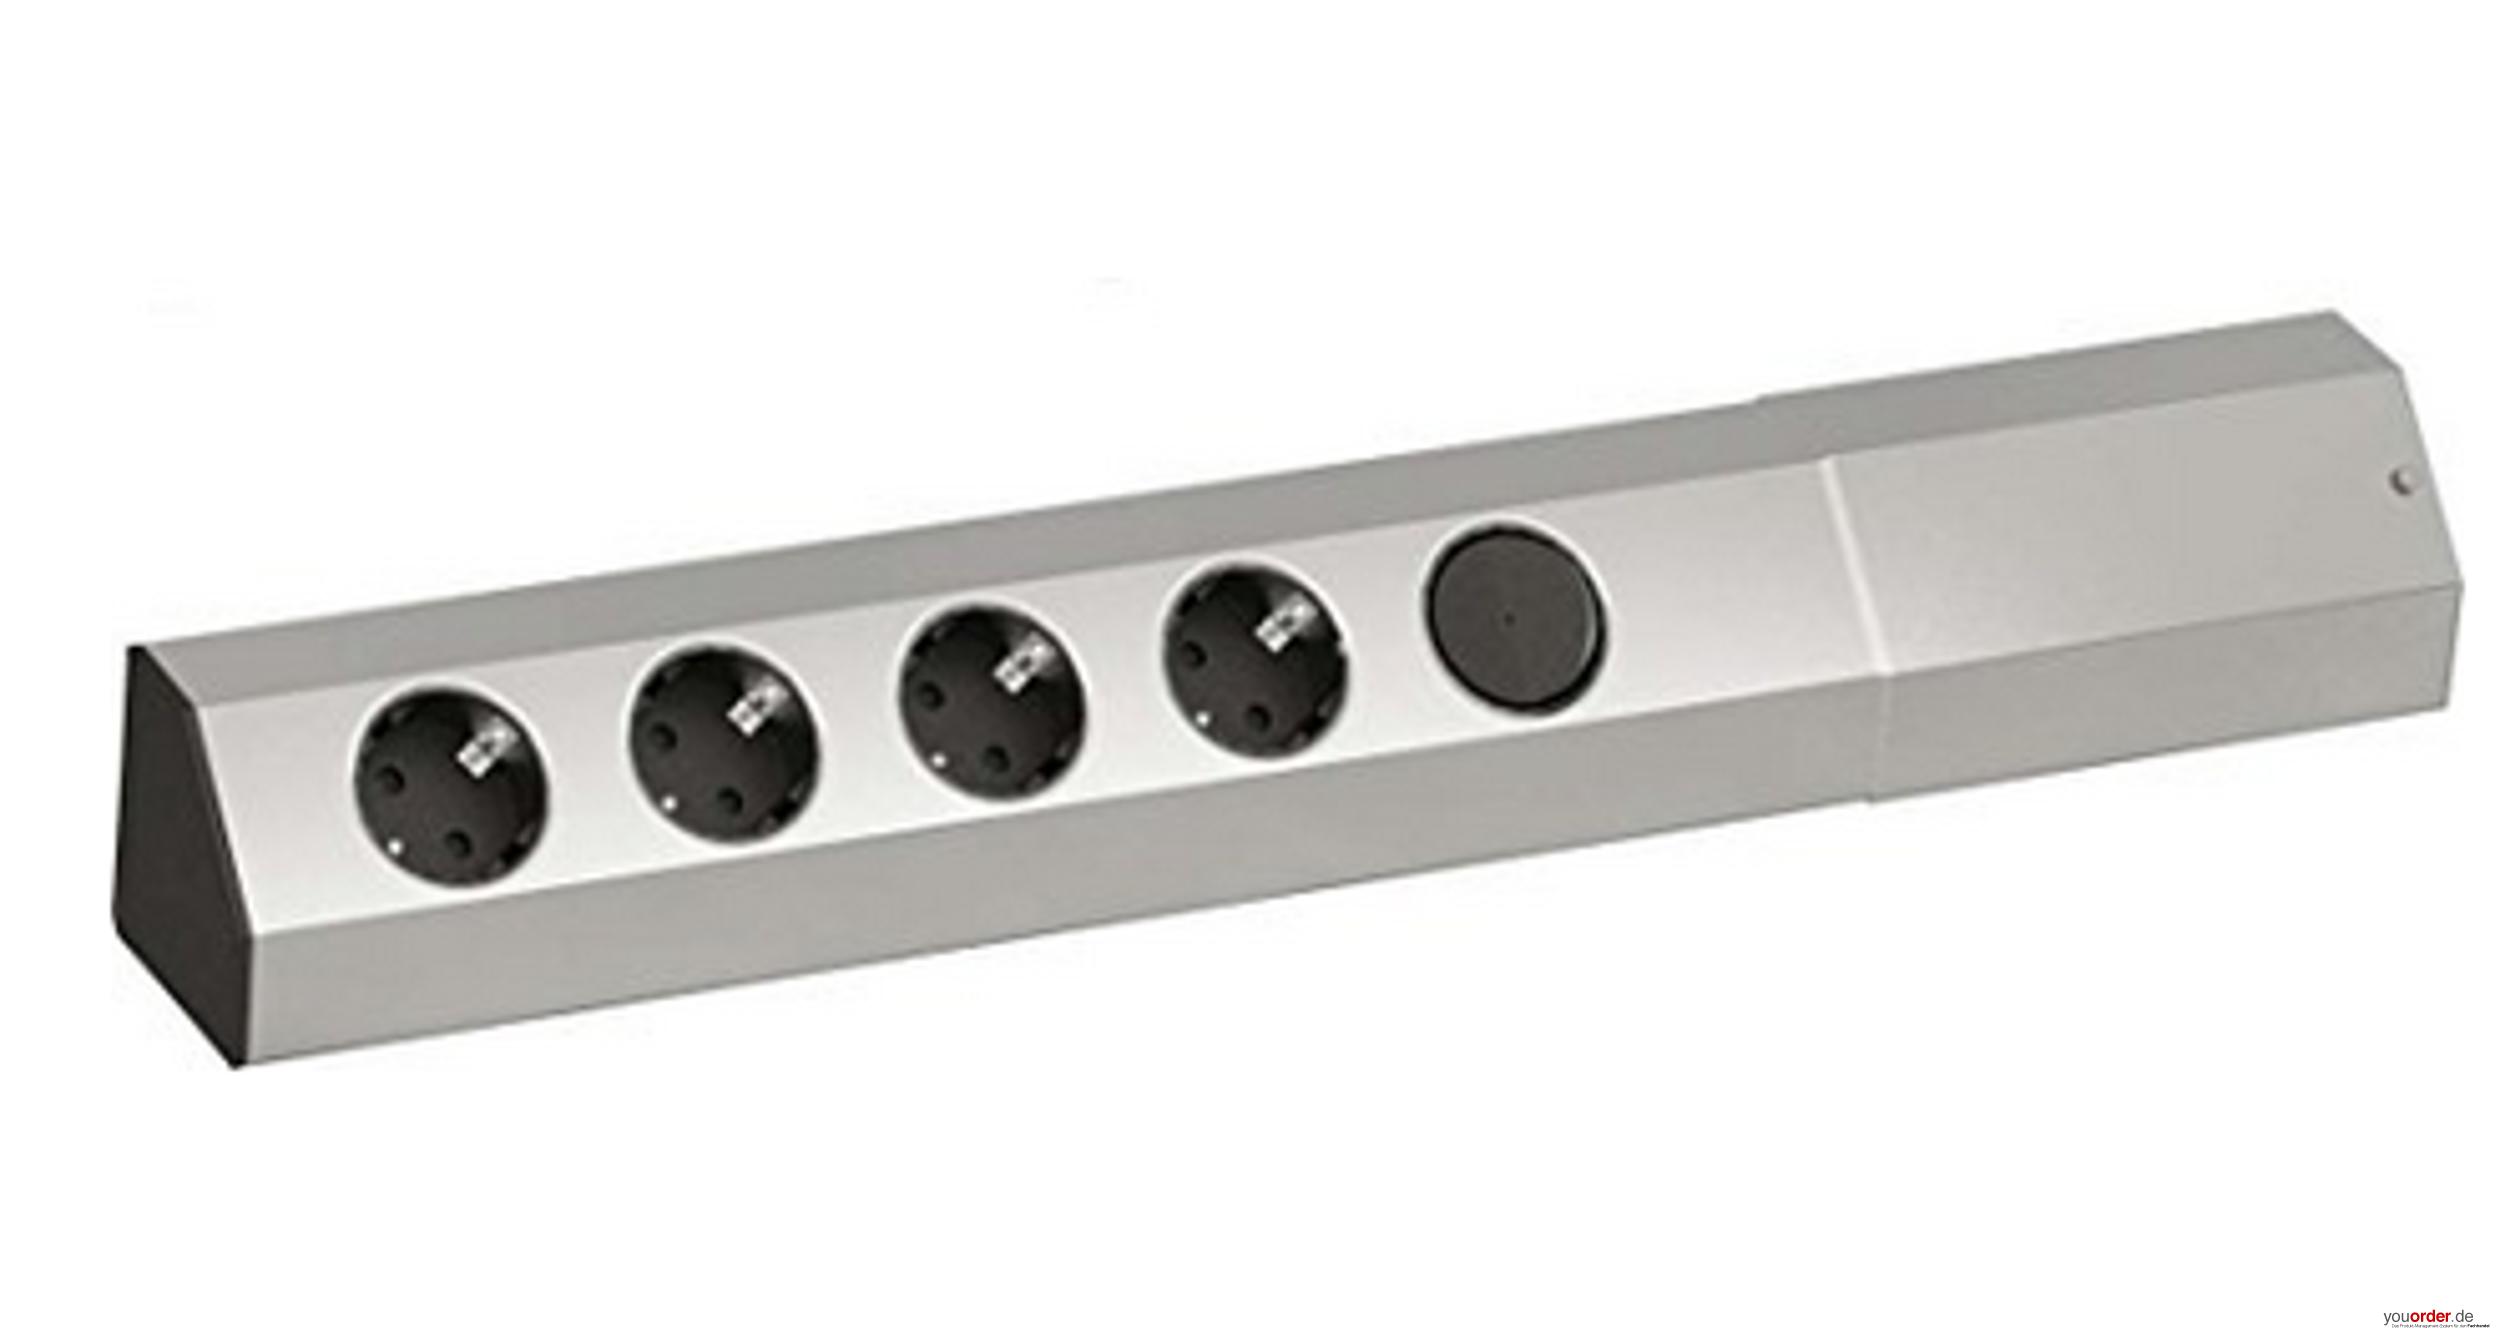 BACHMANN Universal-Steckdosenleiste 4 Steckdosen, 1 Schalter